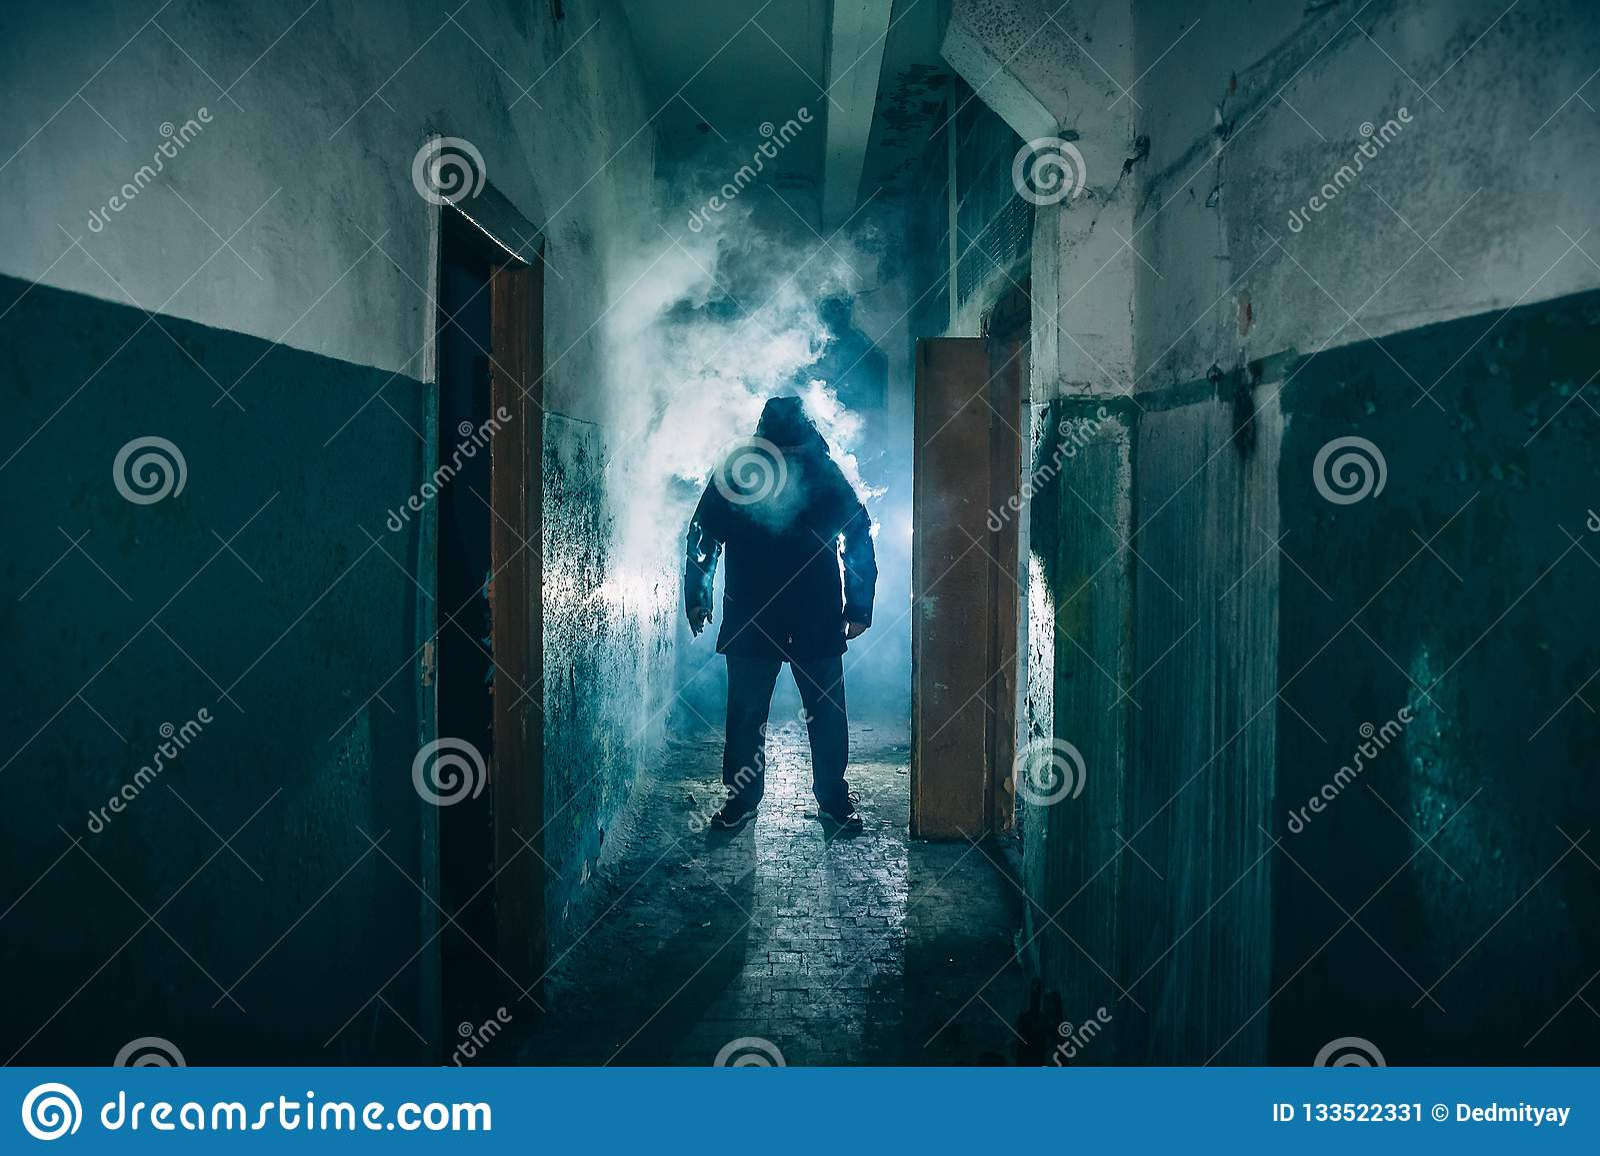 Donker silhouet van de vreemde gevaarsmens in kap in achterlicht met rook of mist in enge grungegang of tunnel